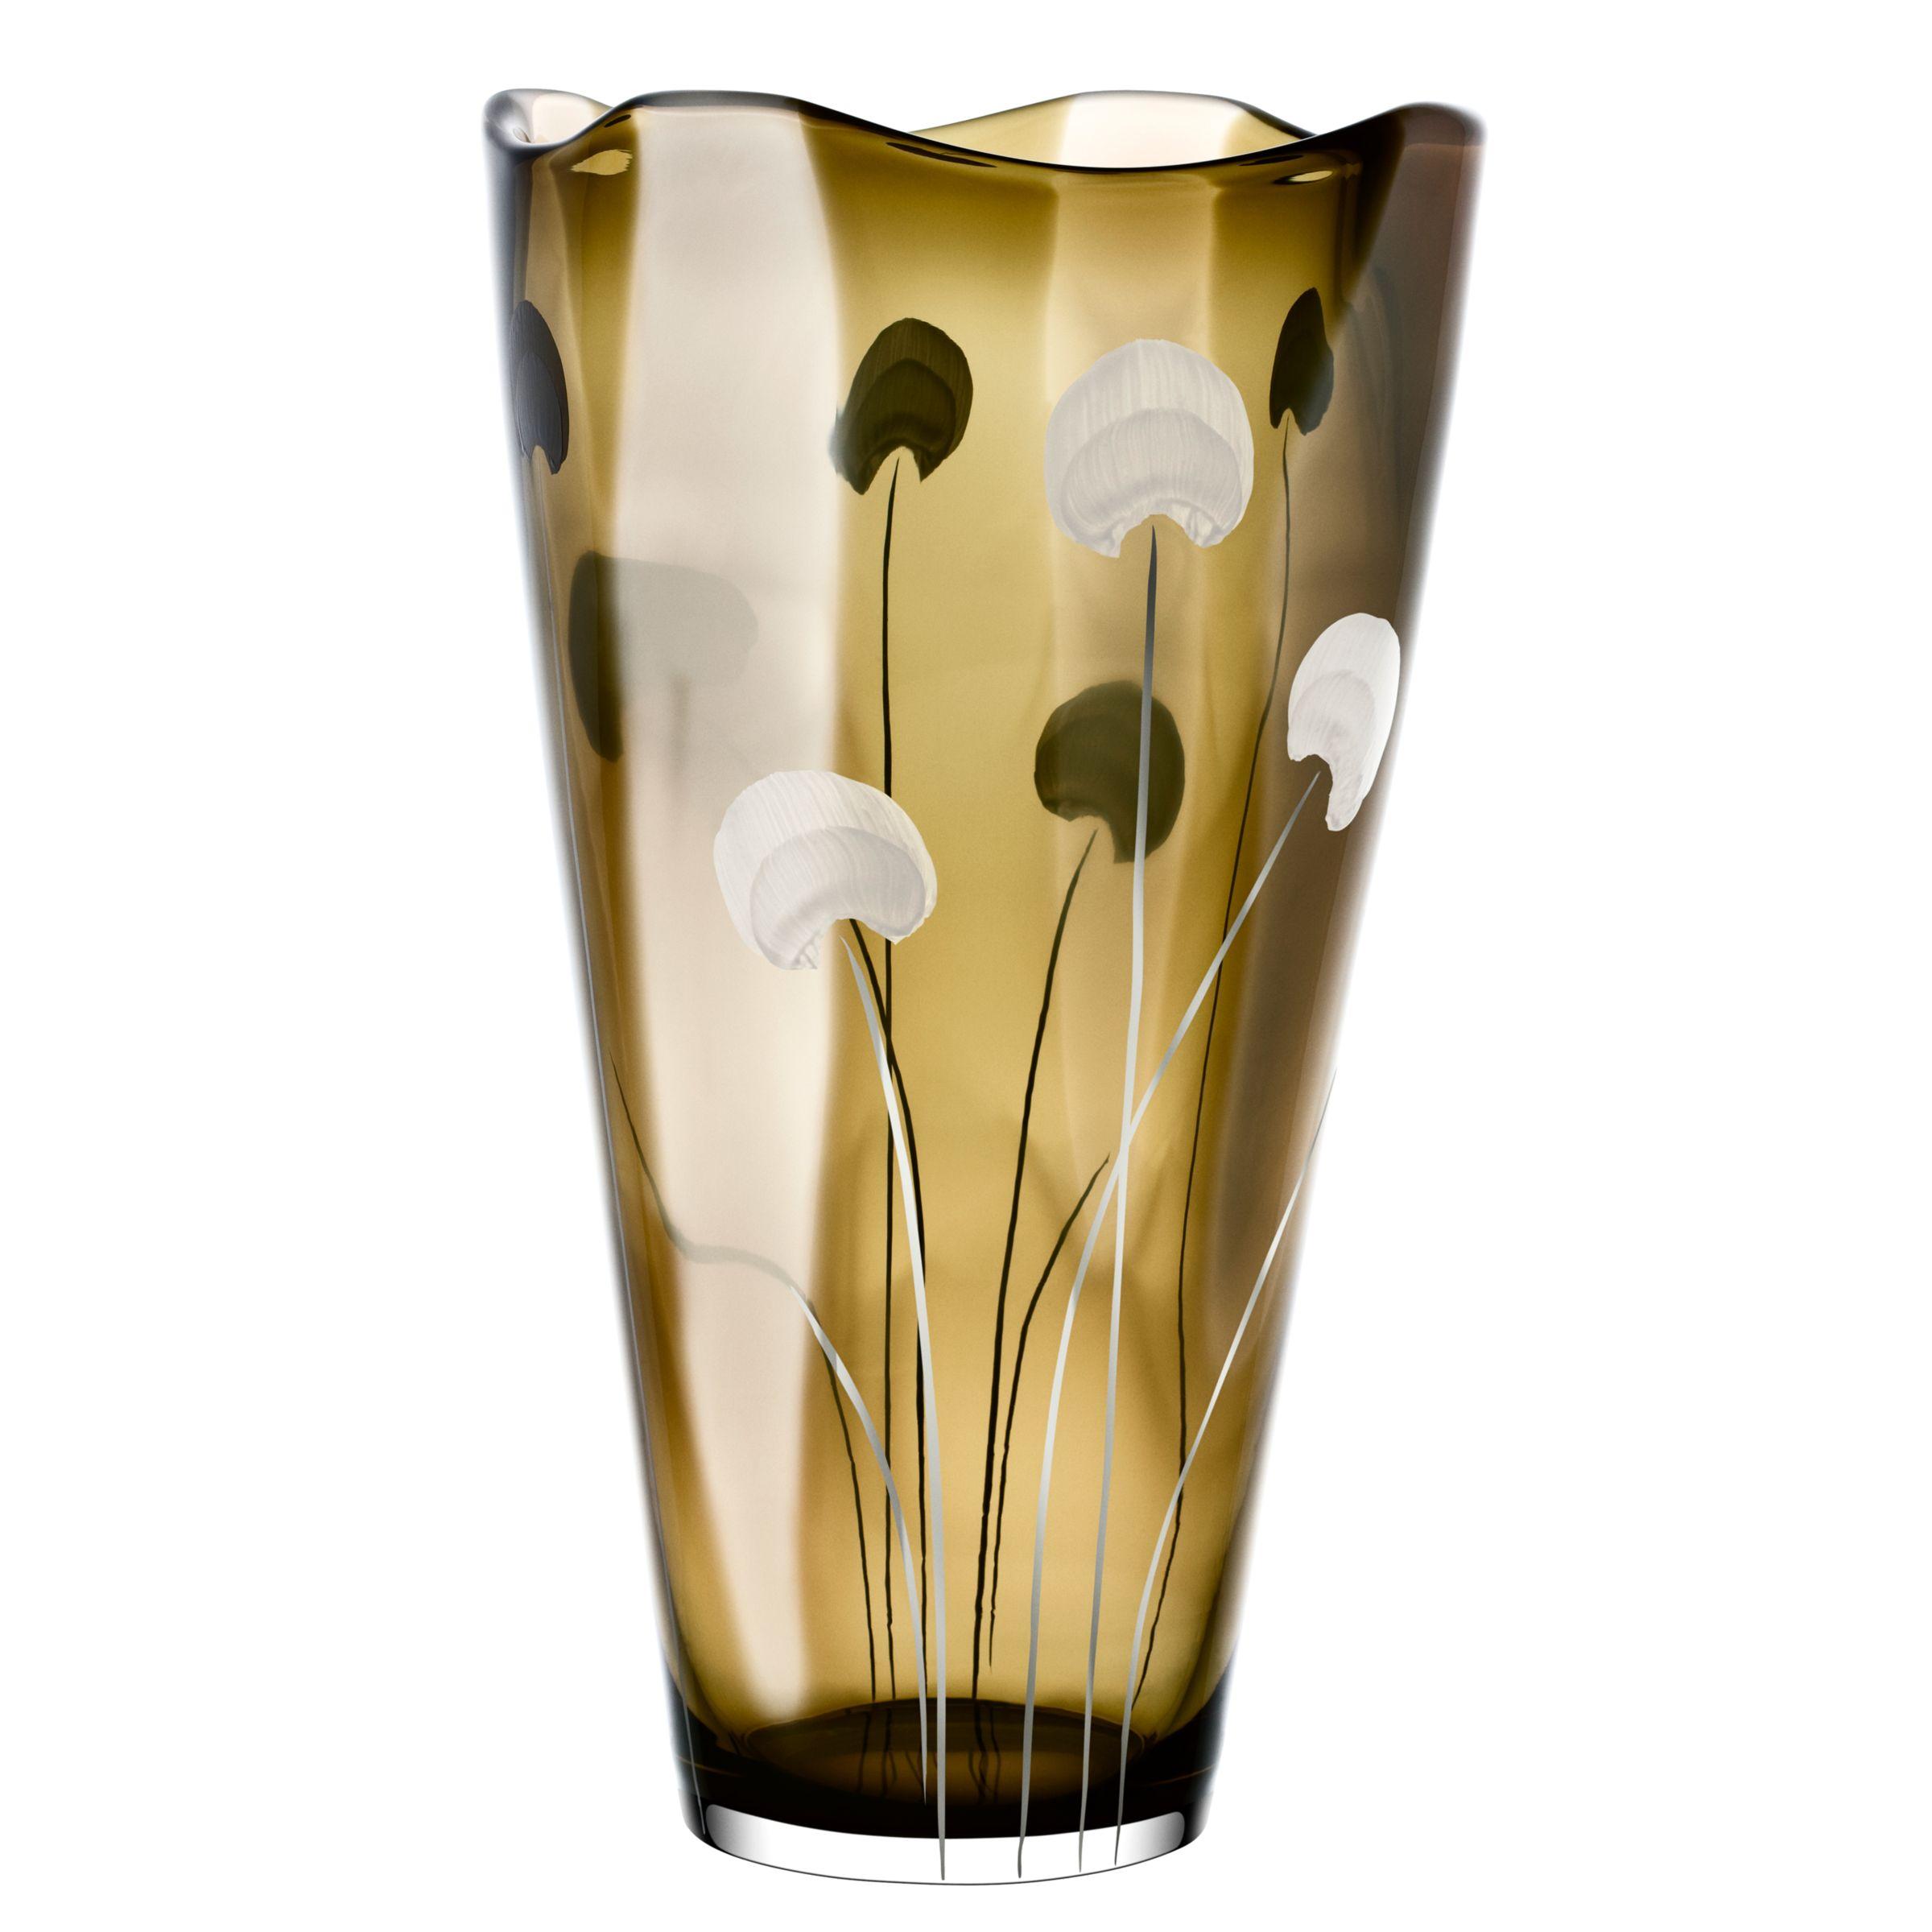 Kosta Boda Spring Blossom Vase at John Lewis